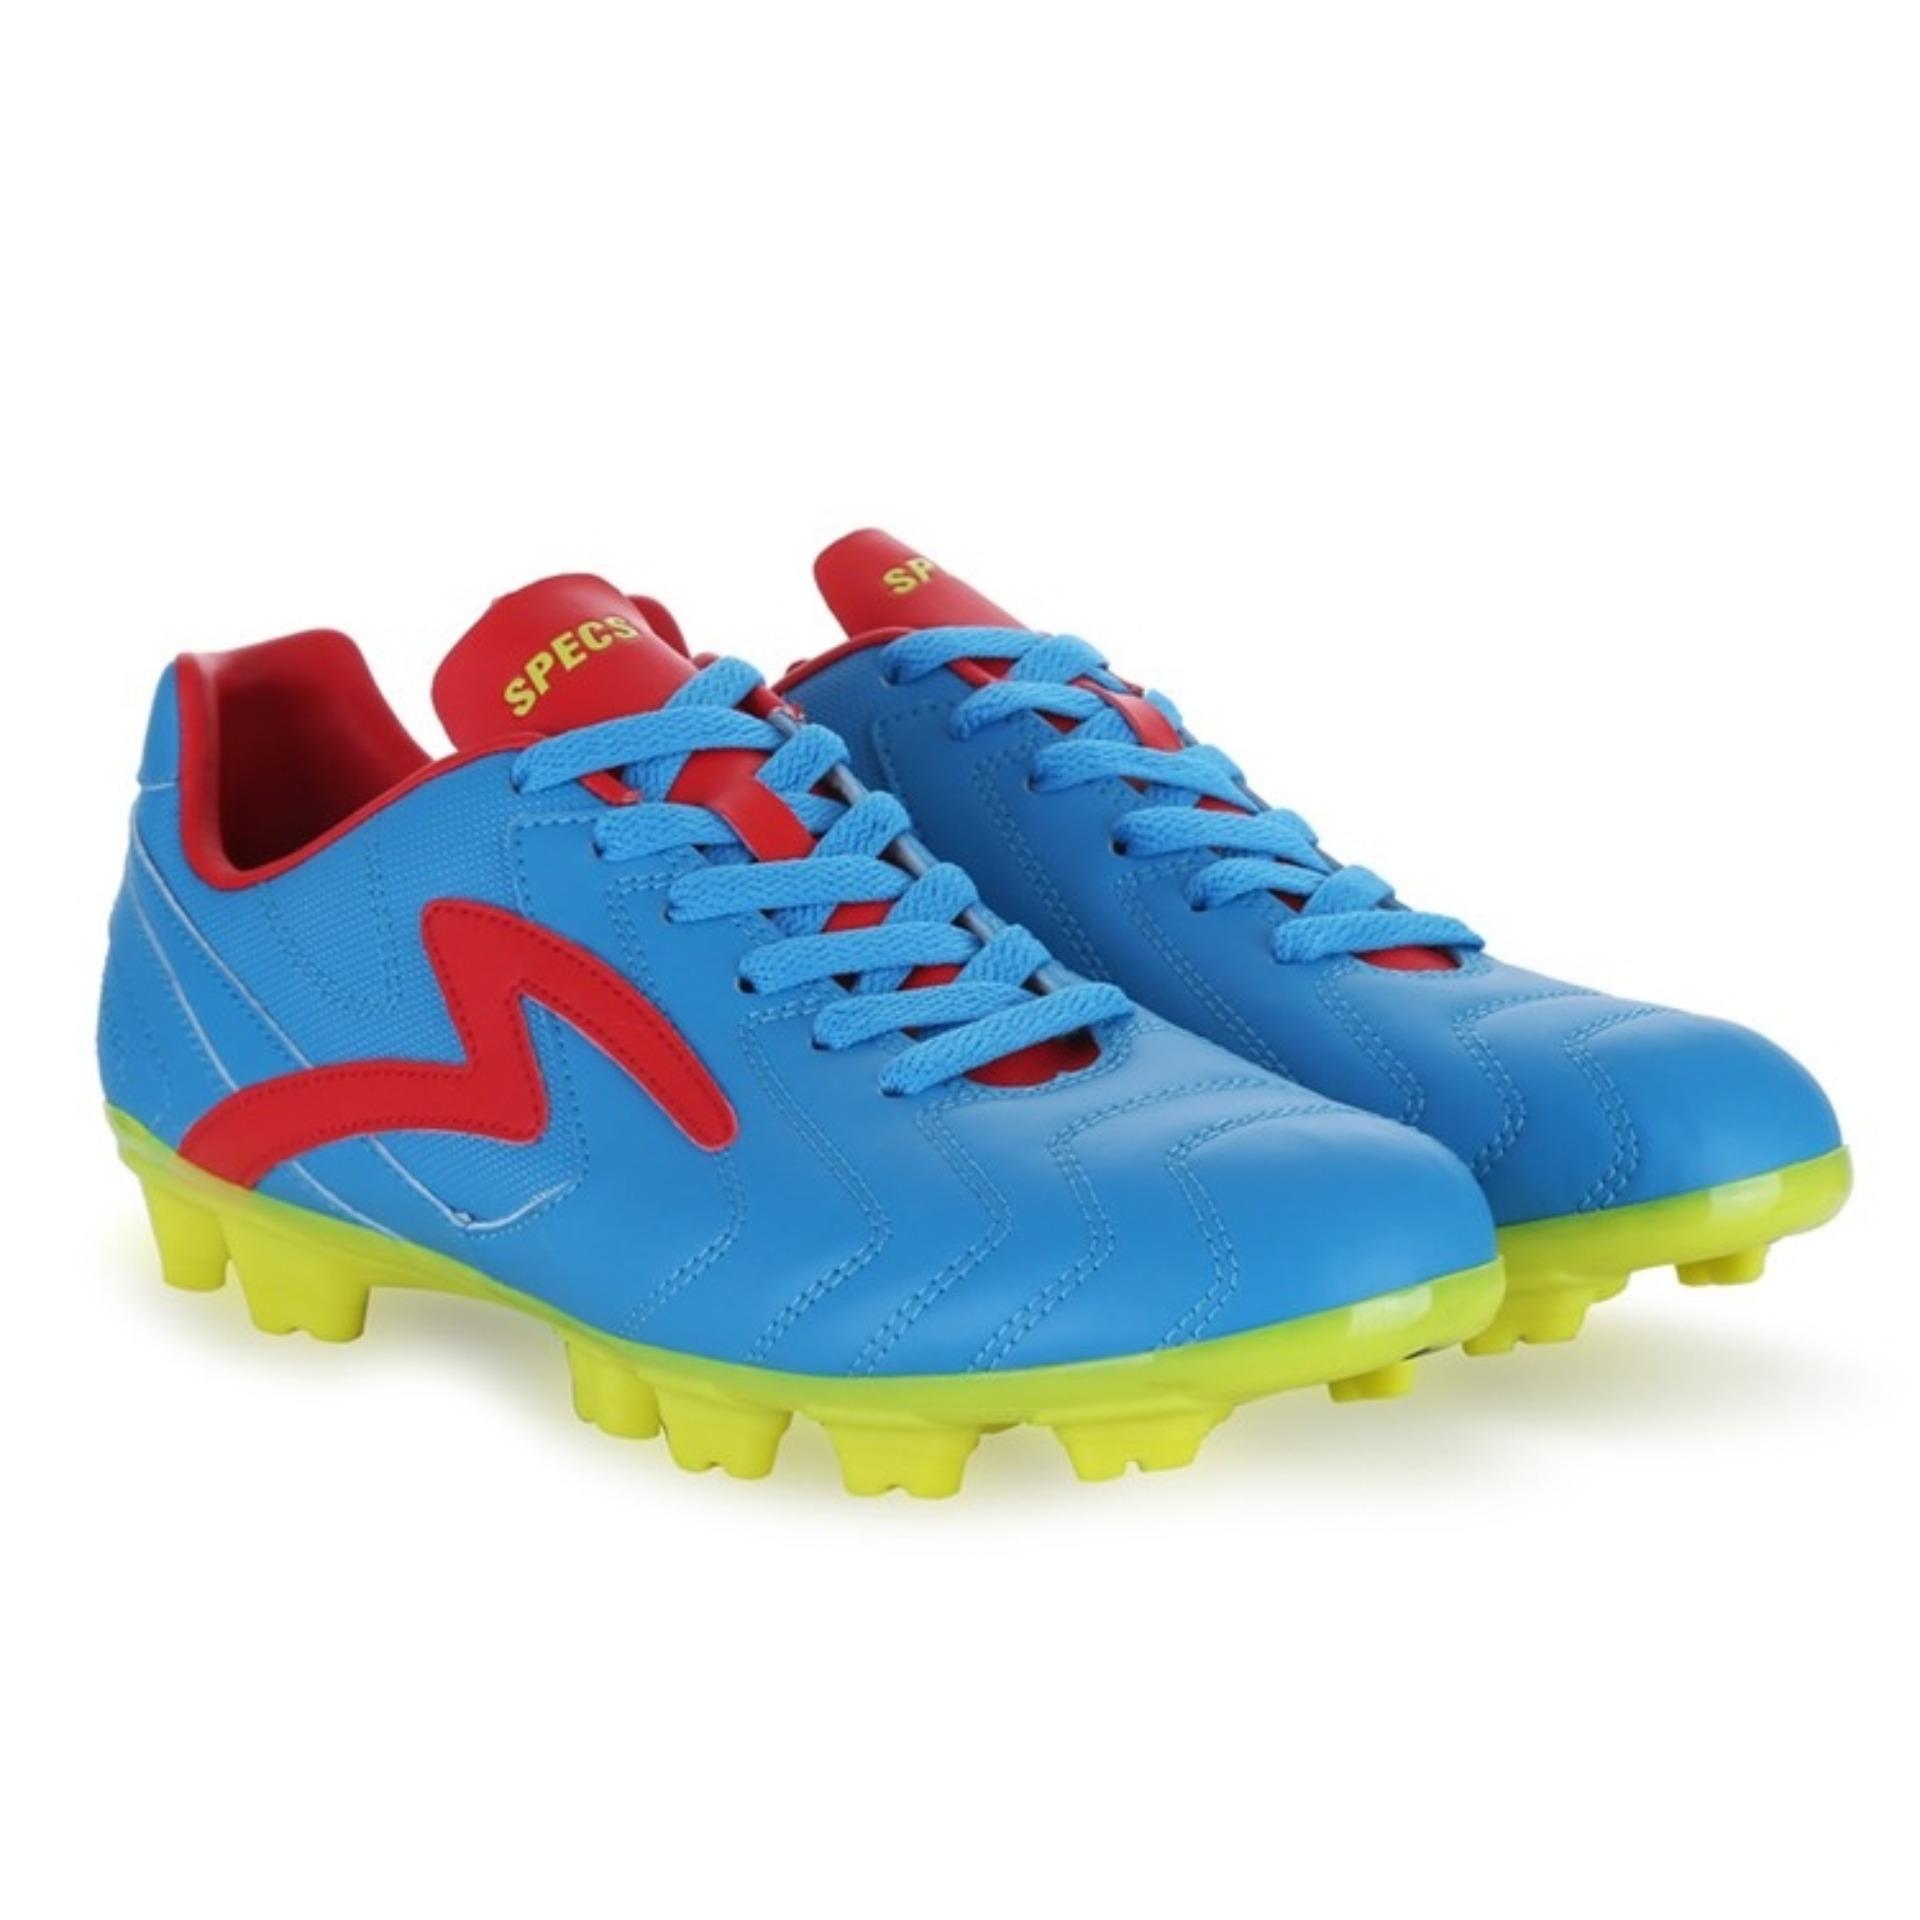 Specs Valor FG Rock Blue True Red Toxic Green   Sepatu Sepak Bola